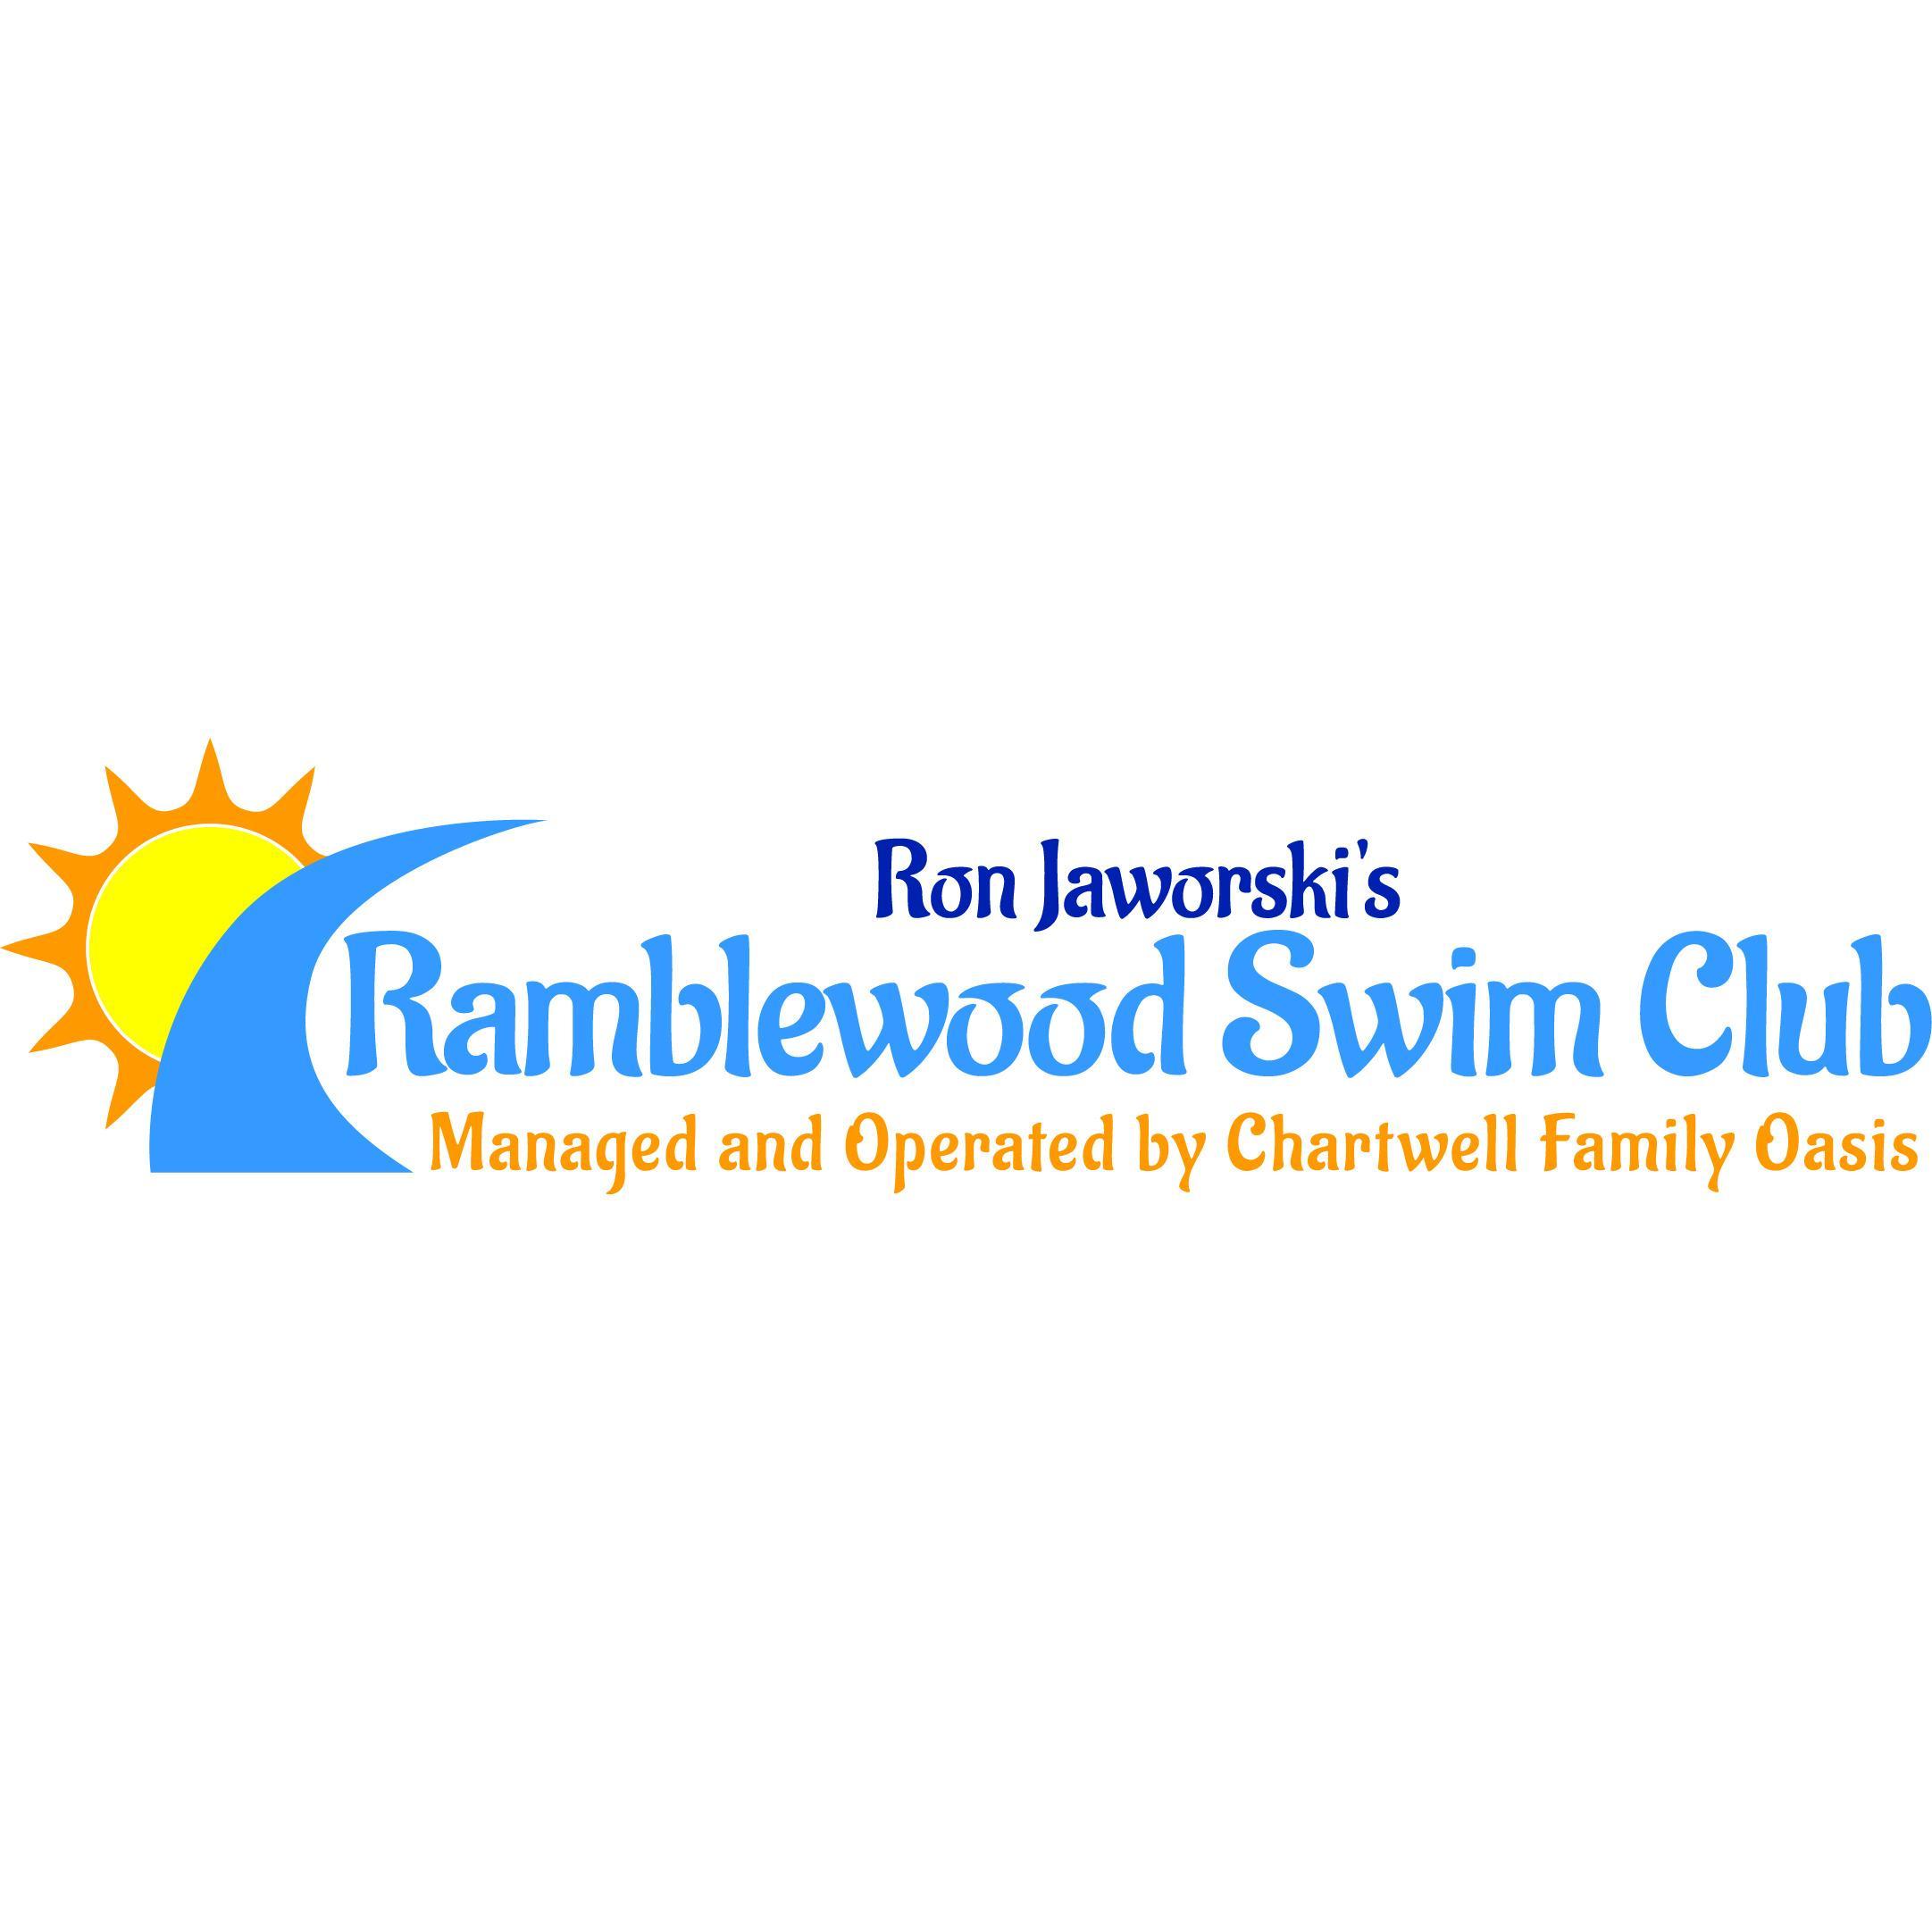 Ramblewood Swim Club